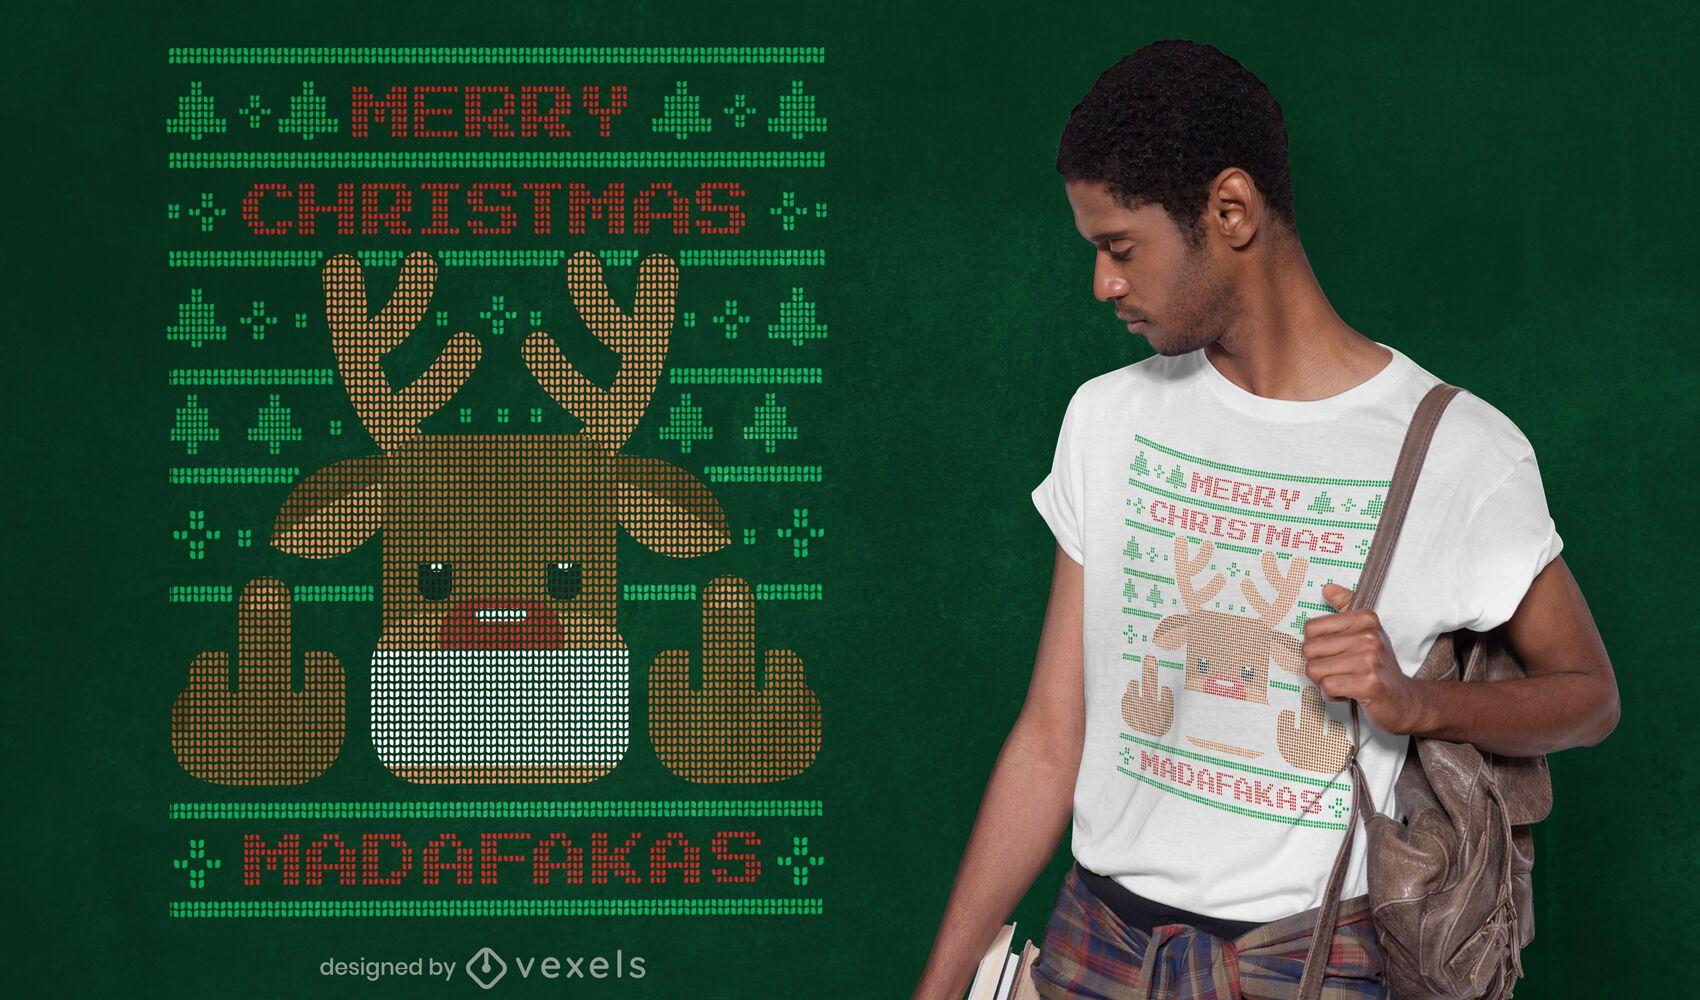 Ugly sweater reindeer t-shirt design